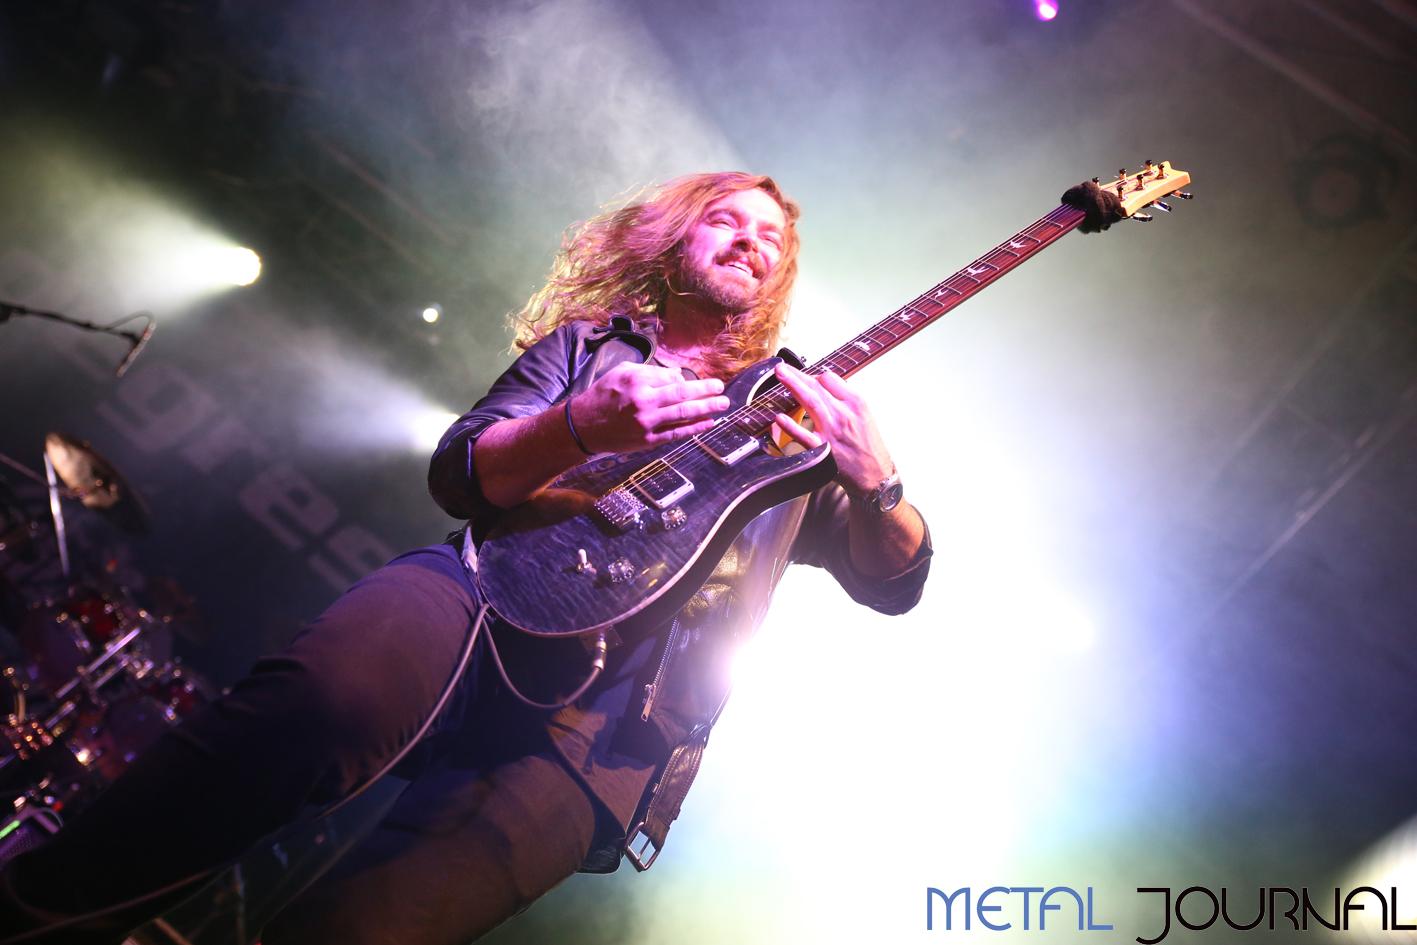 degreed - metal journal 2017 pic 3